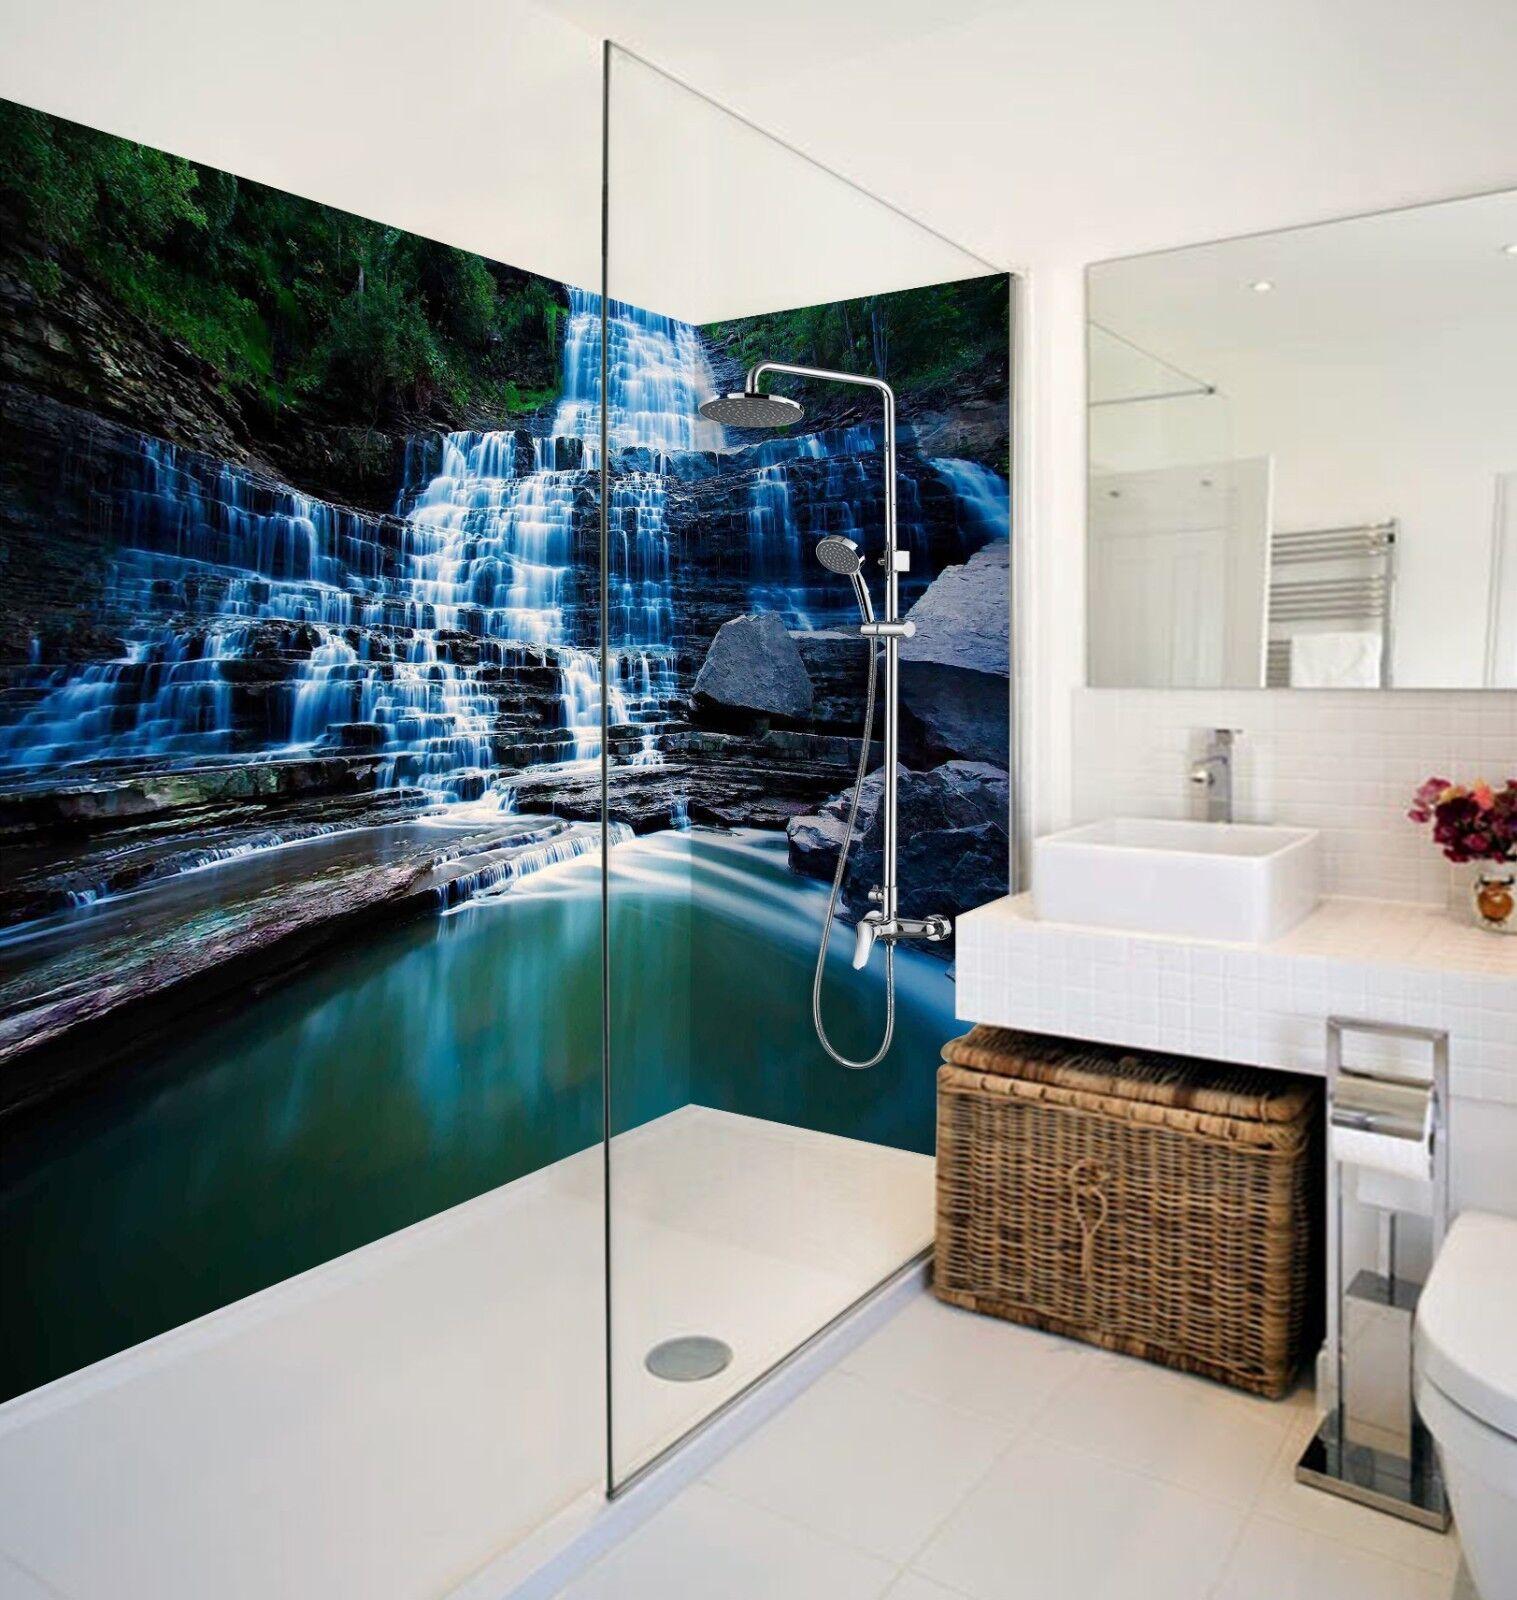 3D Waterfall Steps WallPaper Bathroom Print Decal Wall Deco AJ WALLPAPER UK